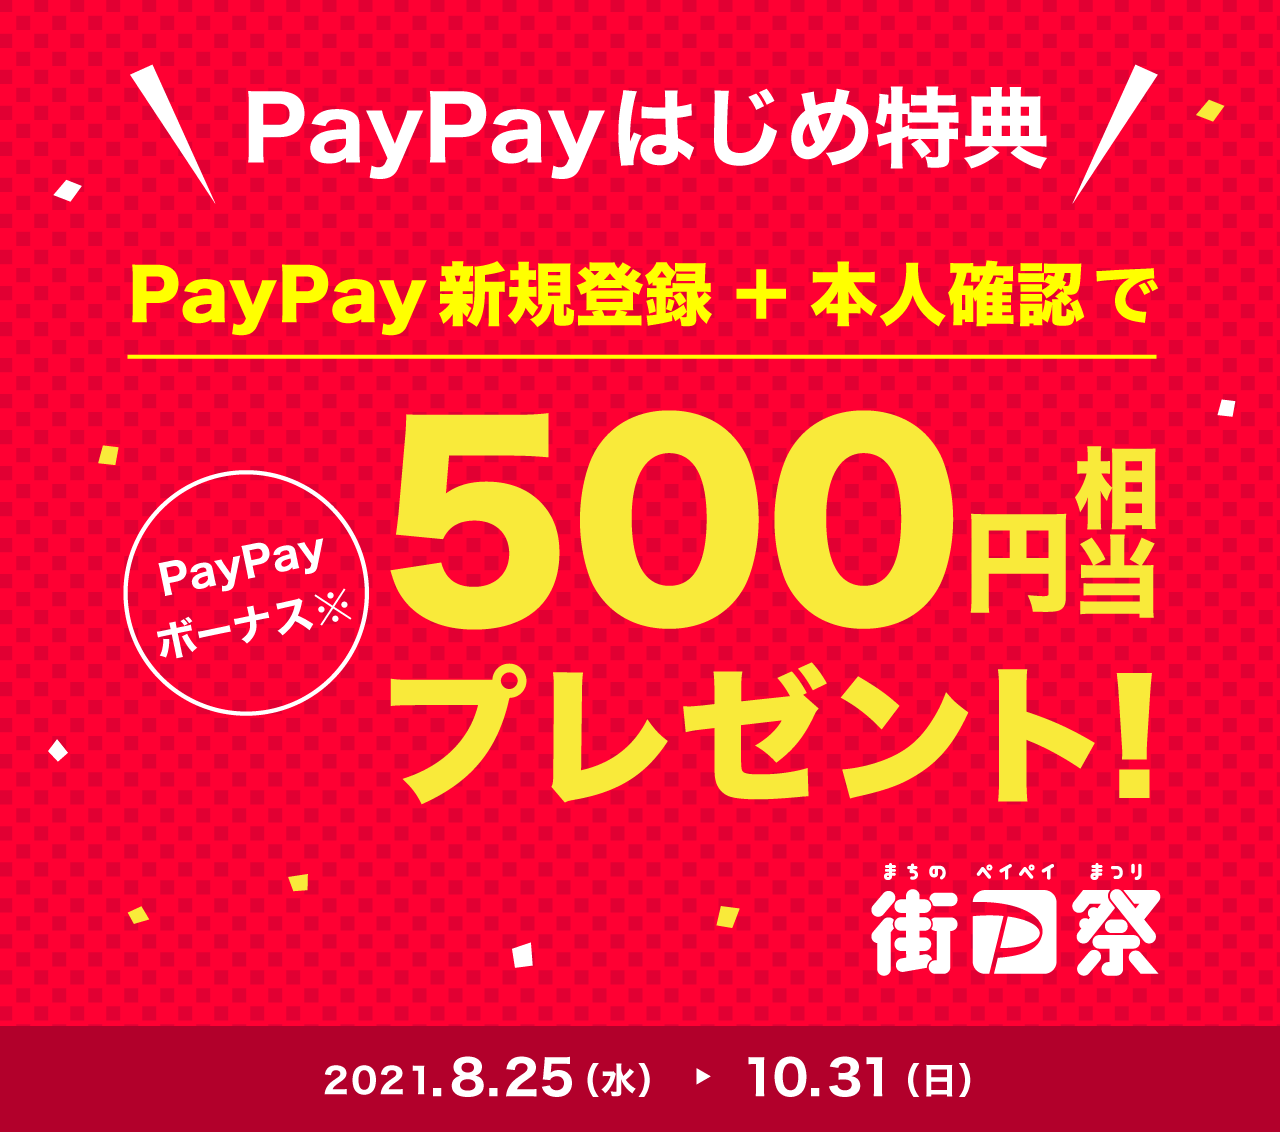 PayPayはじめ特典 PayPay新規登録 + 本人確認で PayPayボーナス(※)500円相当プレゼント!